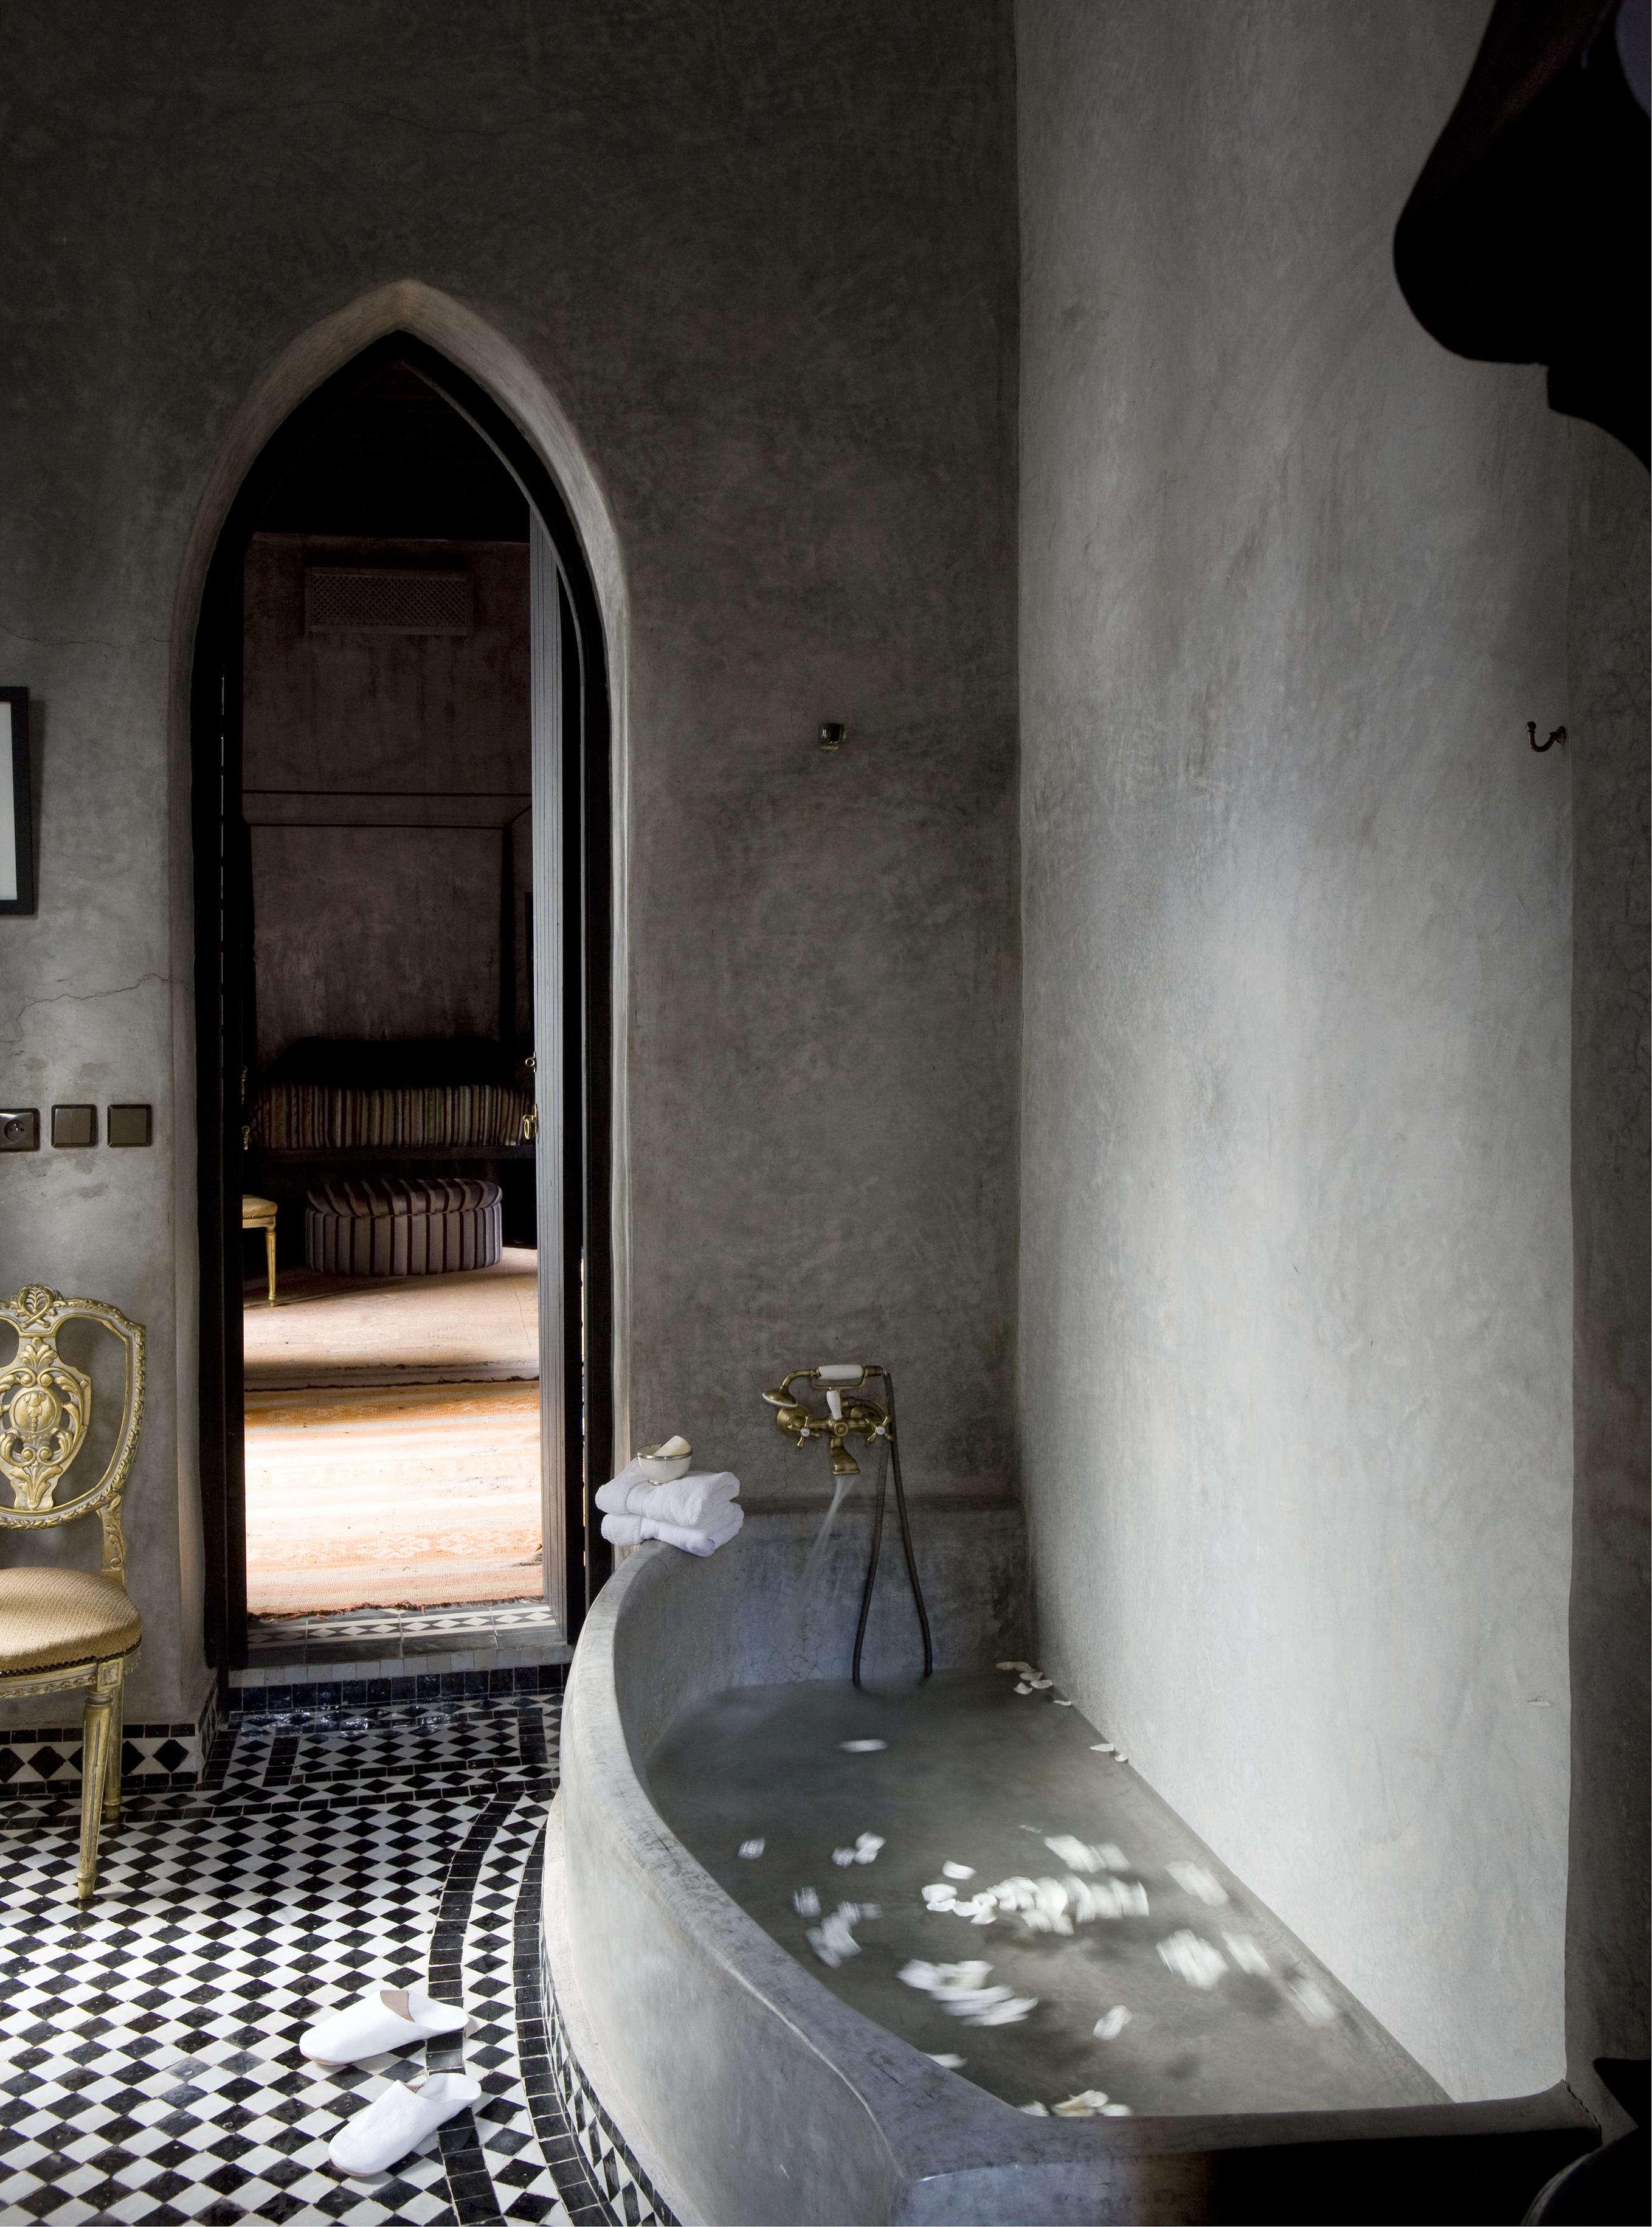 Riad in Marrakech, Morocco by Stefania Giorgi Photography